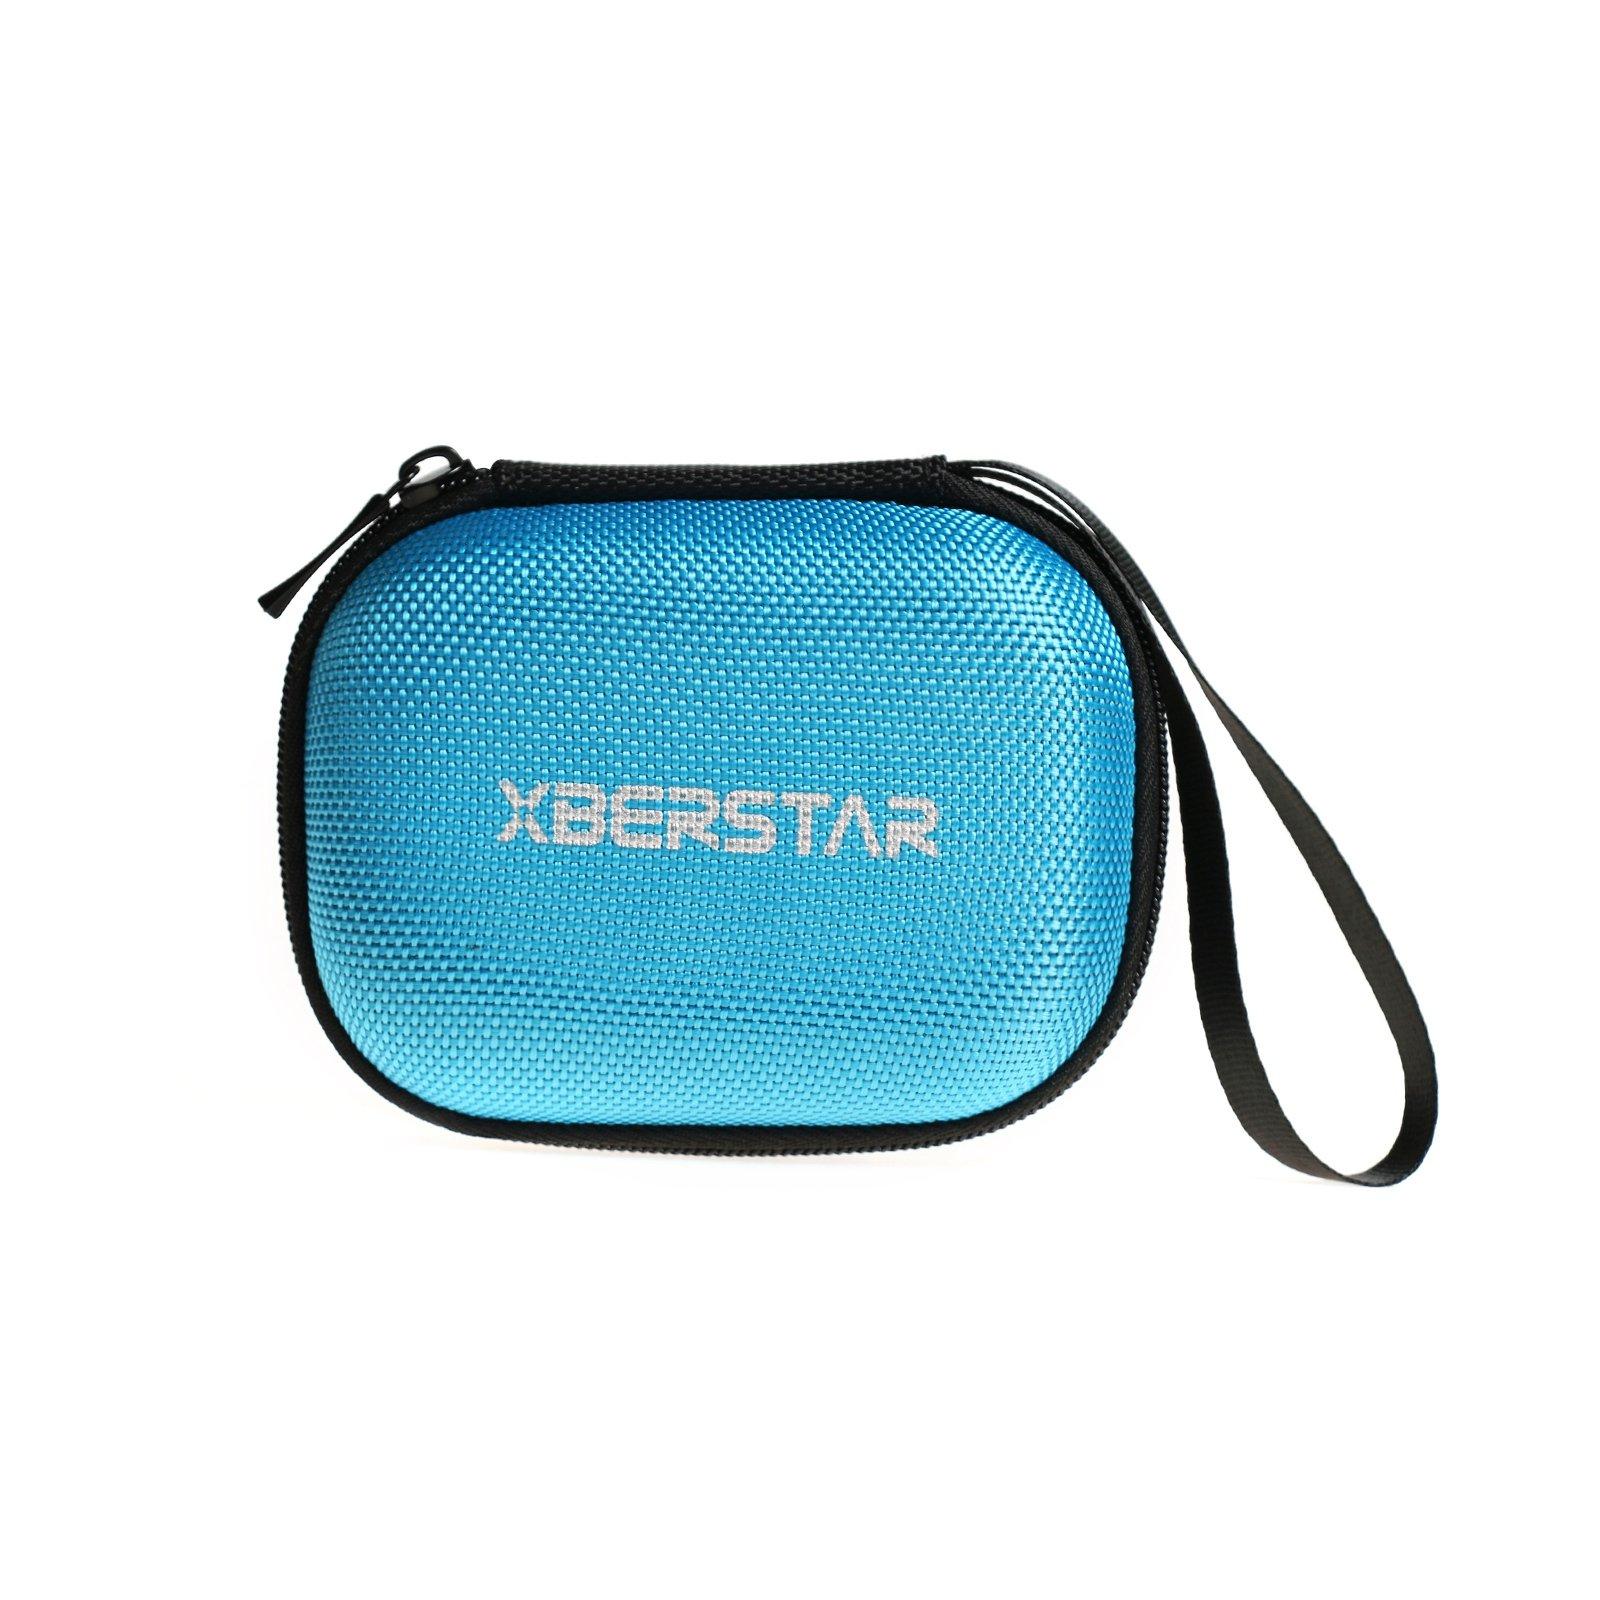 Hard EVA Carrying Case Bag for Garmin Edge 20 25 200 500 510 520 800 810 820 Cycling GPS Blue